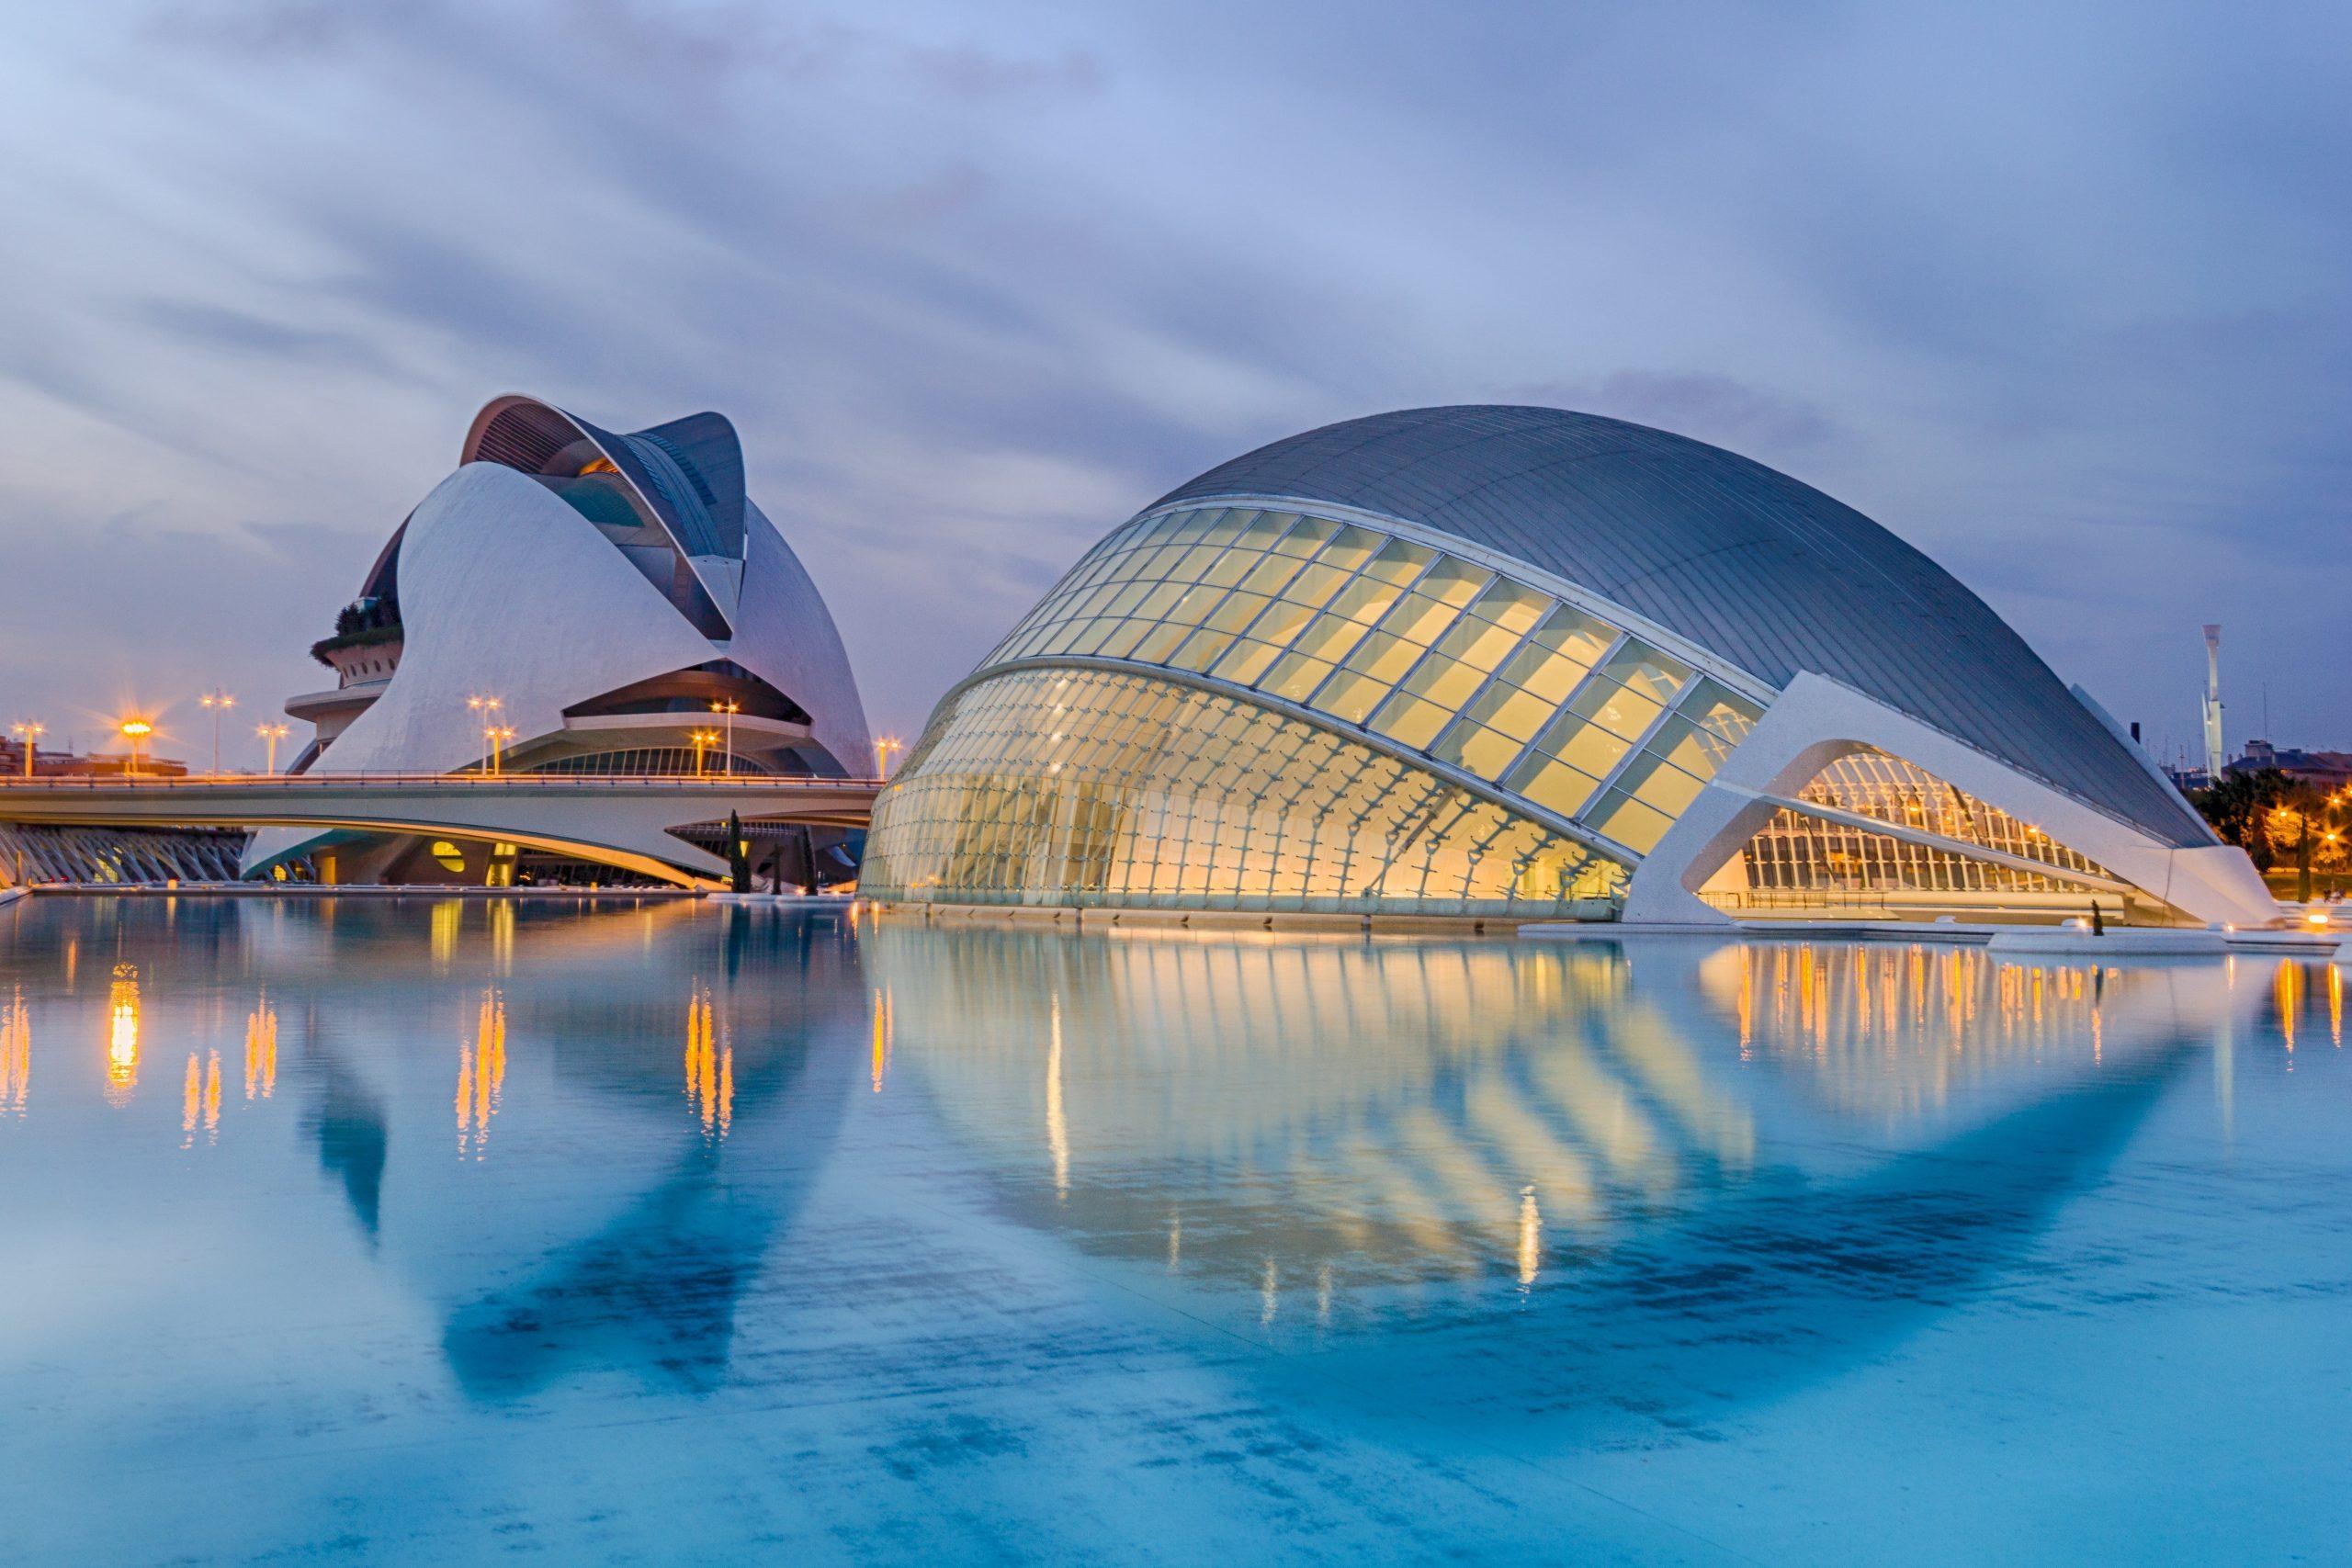 valencia airport to city center, valencia airport to city, How To Get From Valencia Airport To City Center